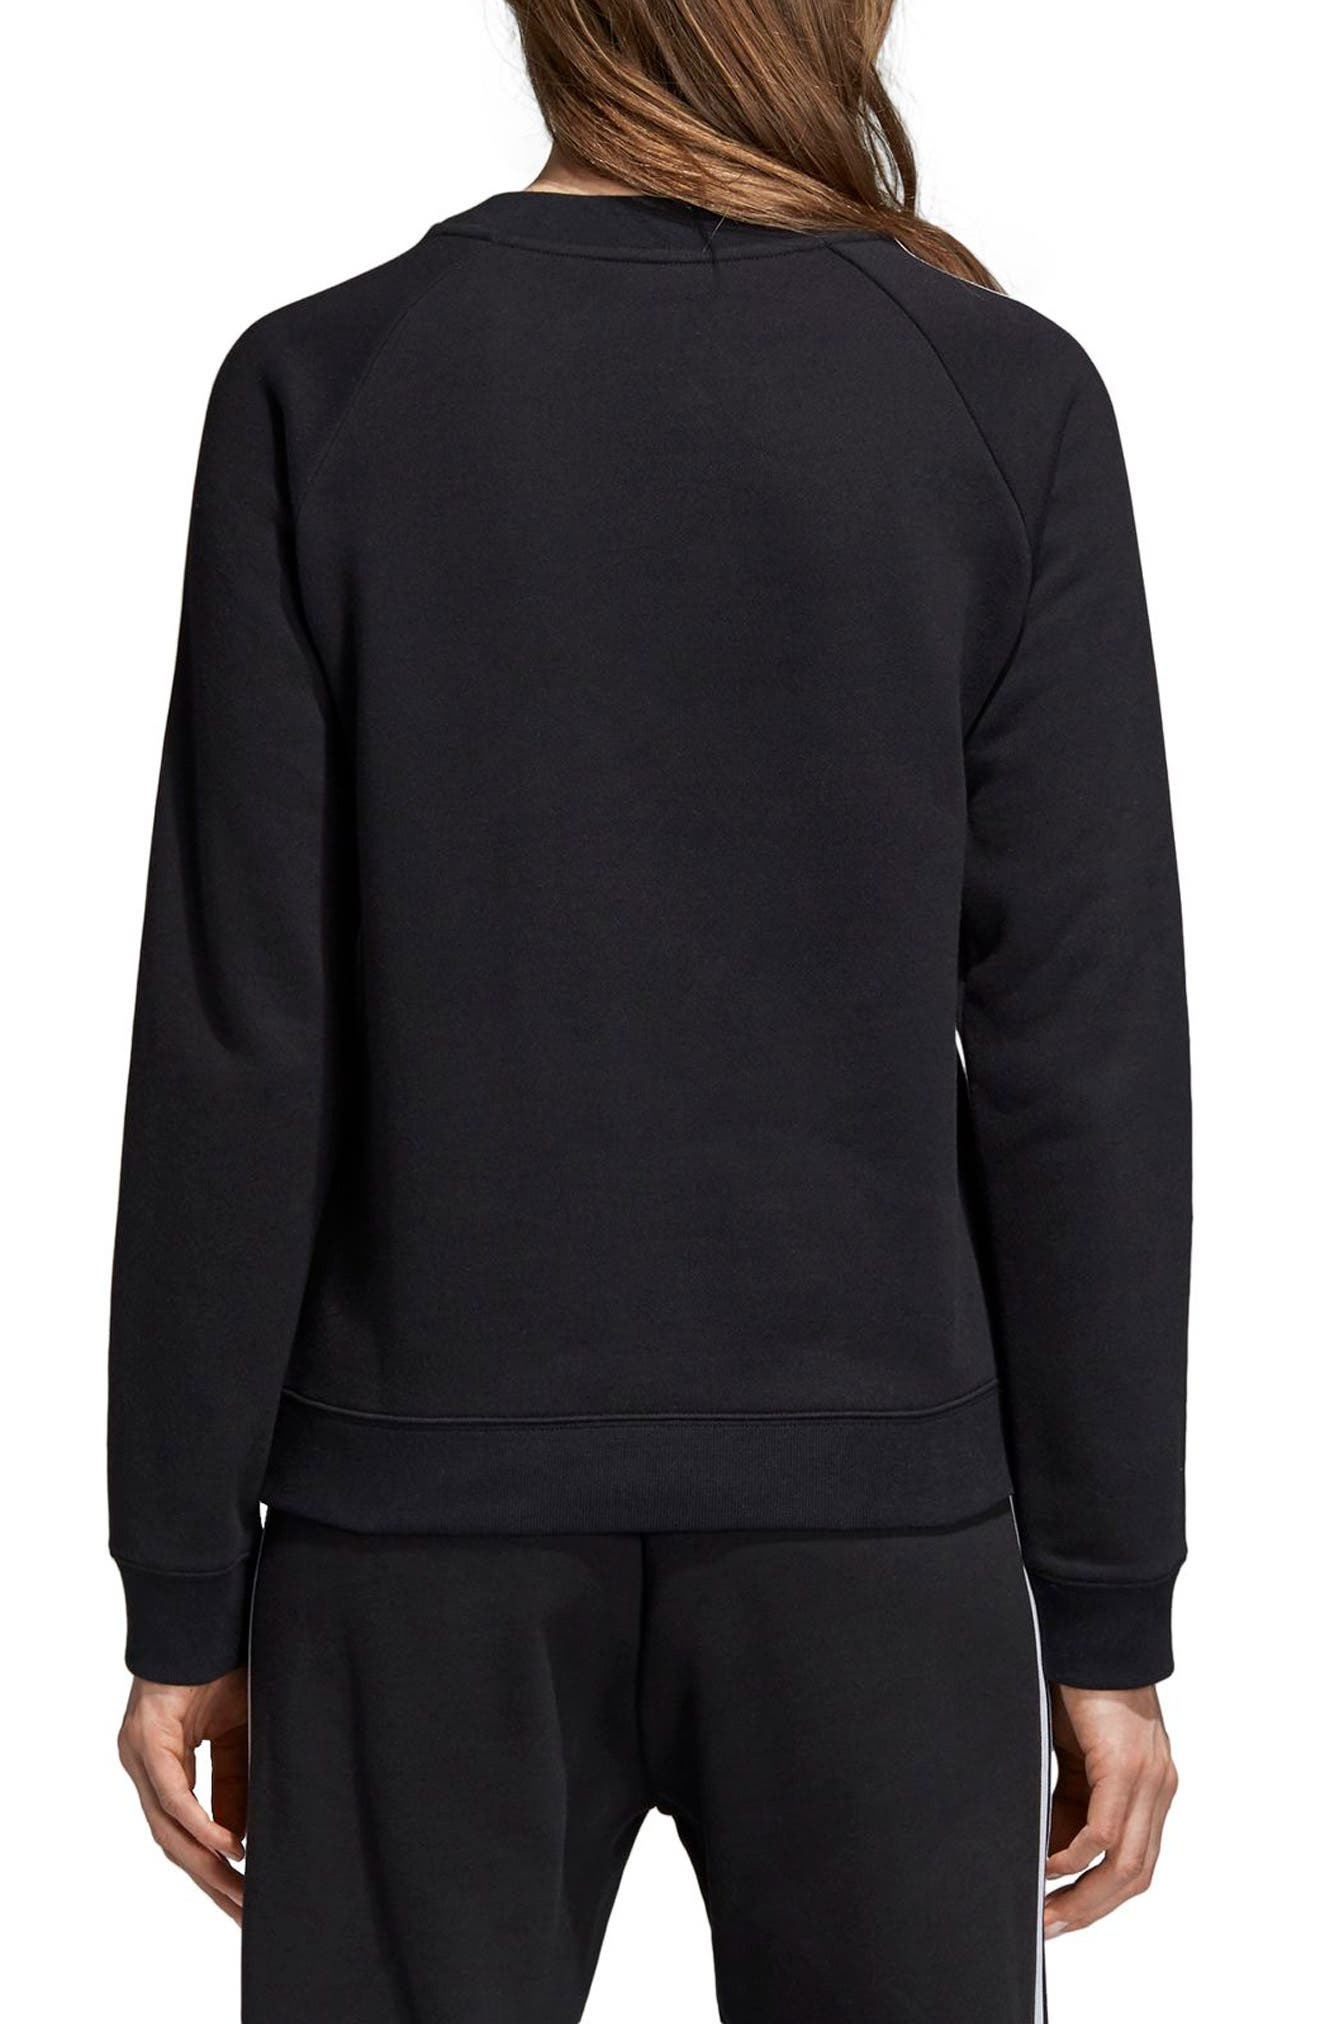 TRF Sweatshirt,                             Alternate thumbnail 2, color,                             BLACK